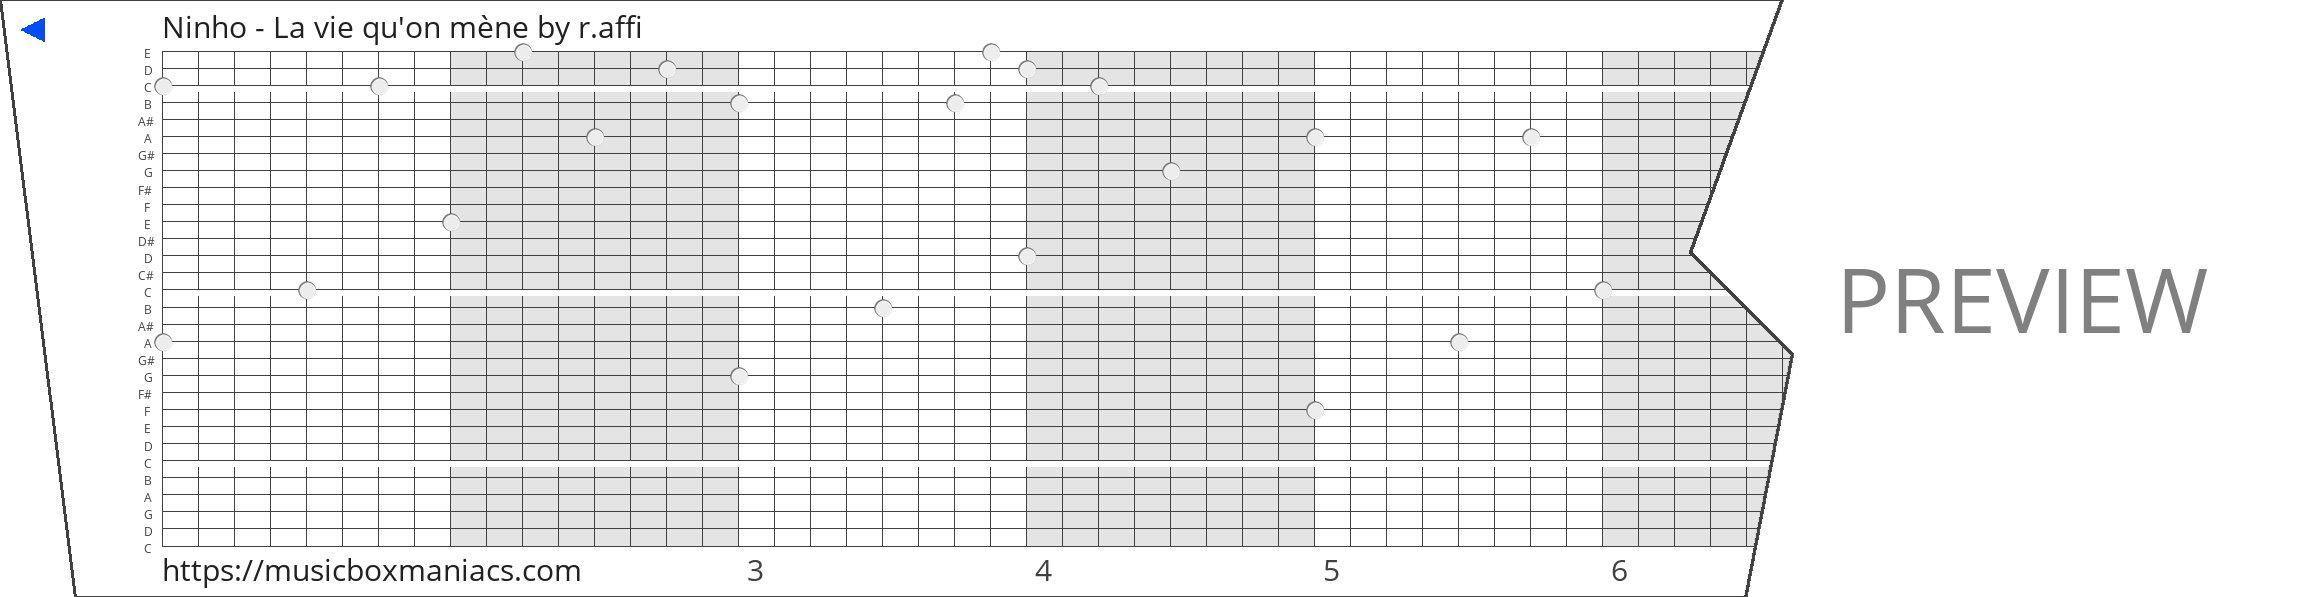 Ninho - La vie qu'on mène 30 note music box paper strip